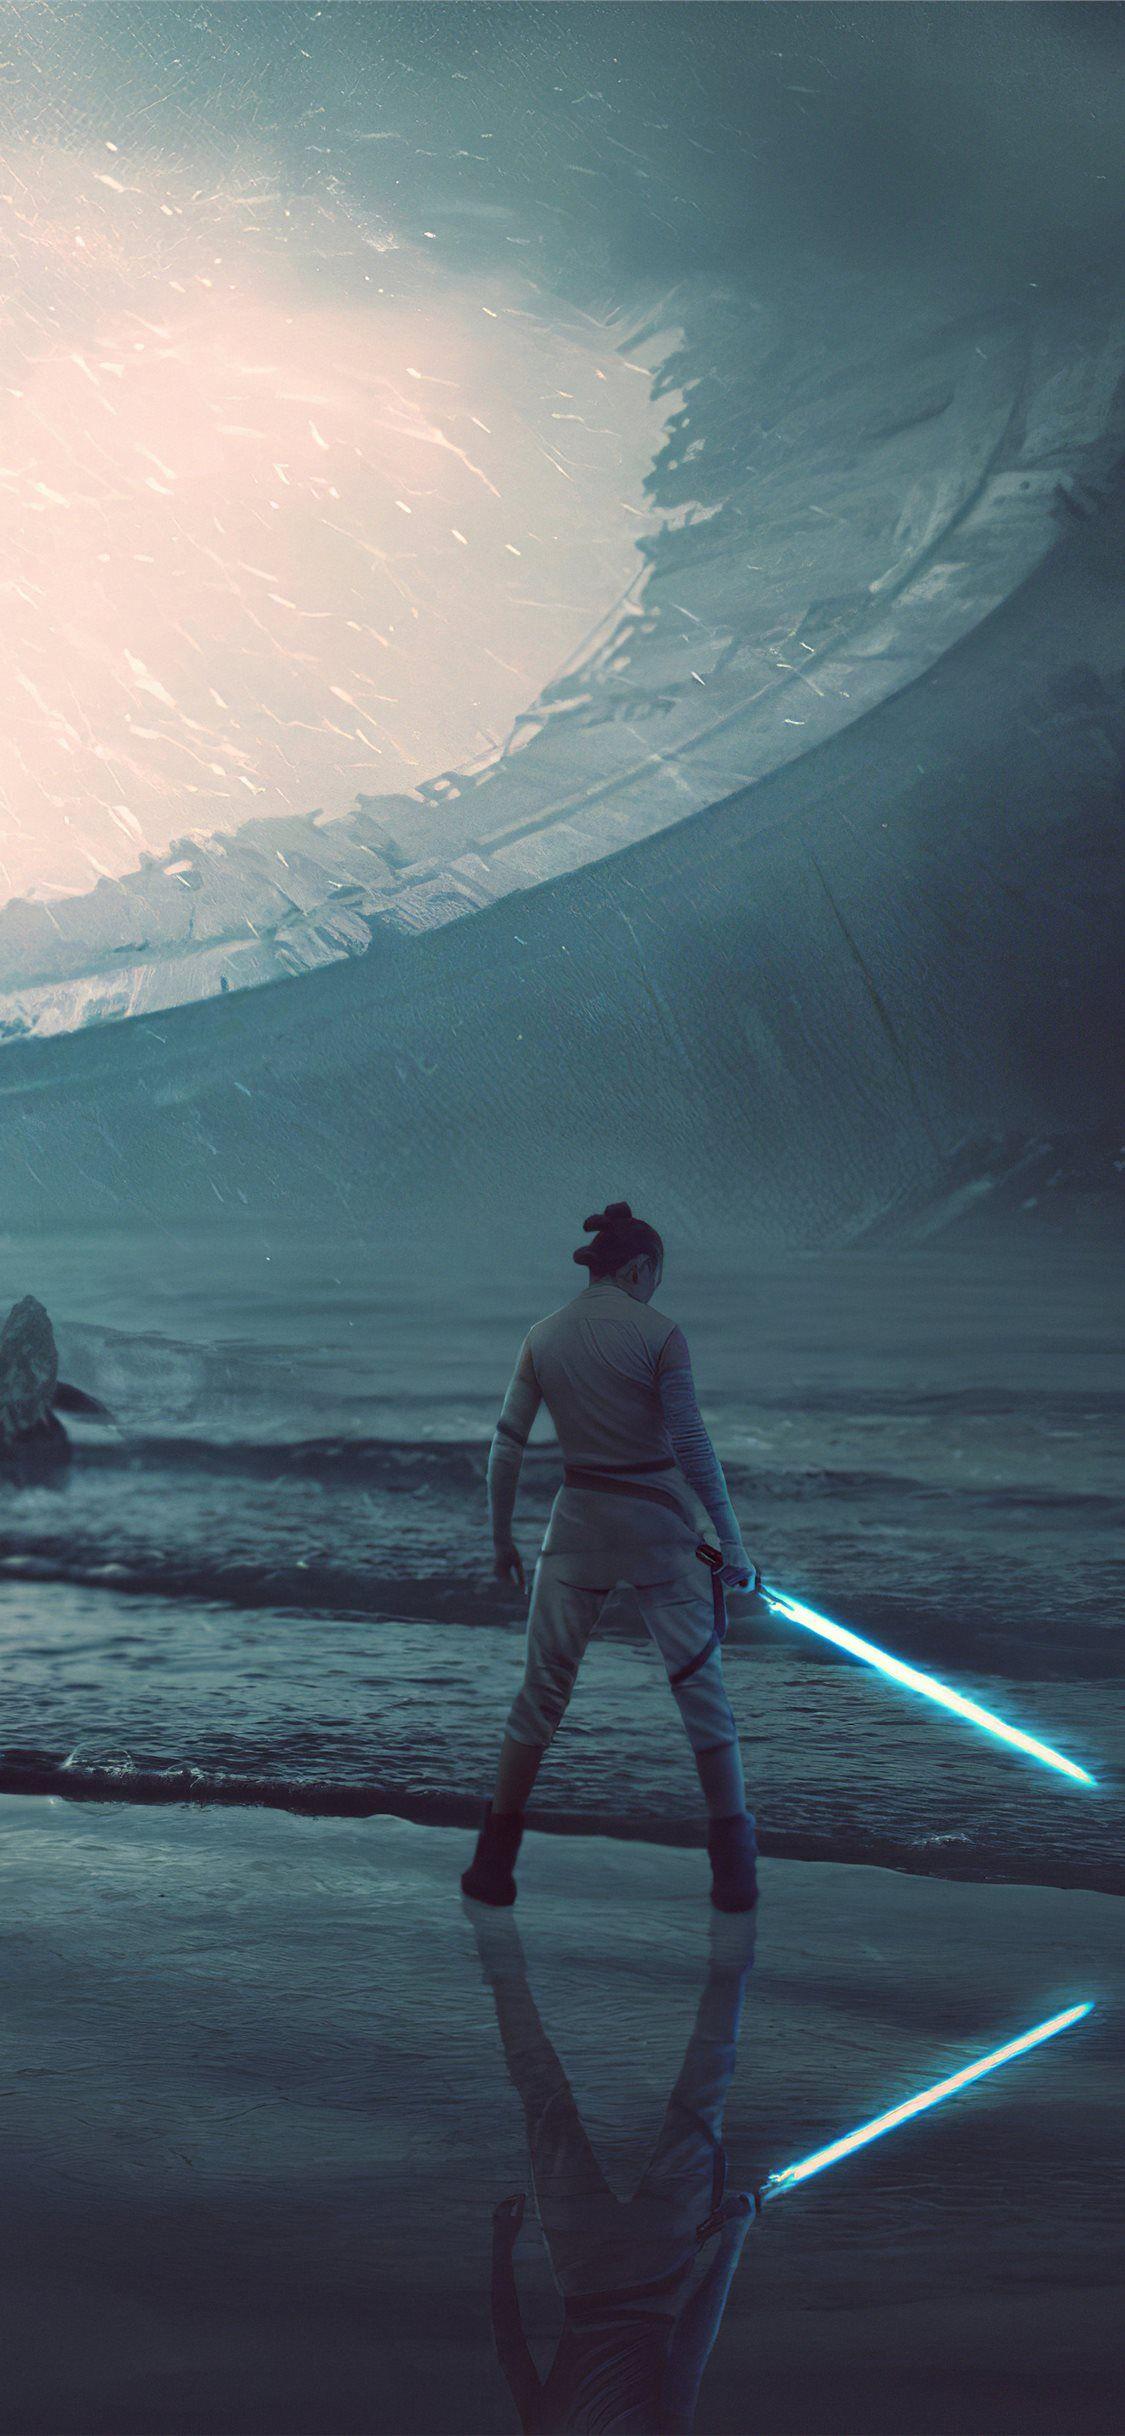 Rey Rise Of Skywalker 4k Star Wars The Rise Of Skywalker Rey Movies 2019 Movies Star Wars Star Wars Background Rey Rise Of Skywalker Rey Star Wars